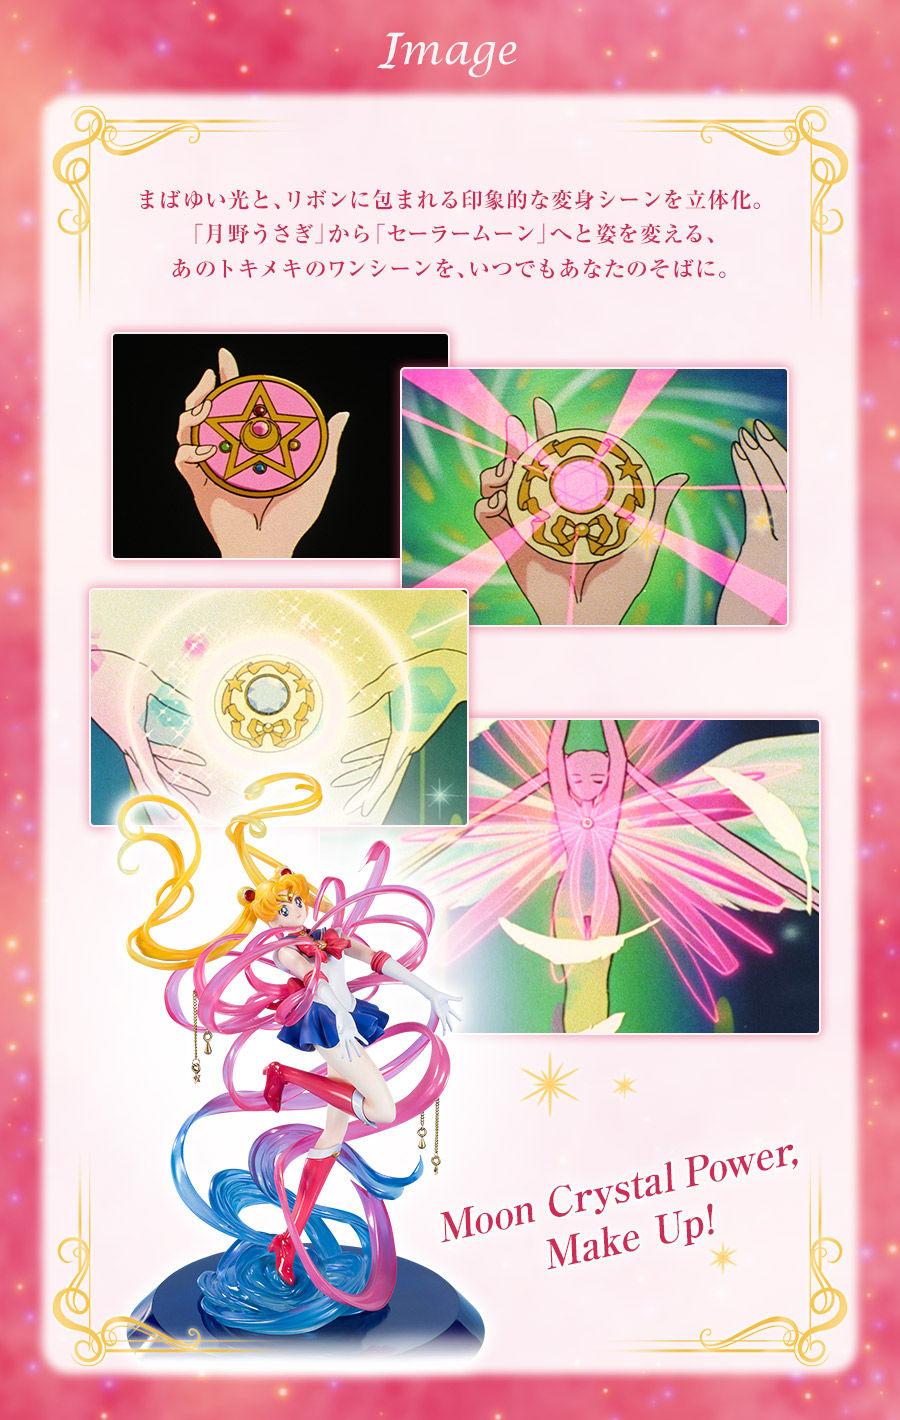 Figuarts Zero chouette 《美少女戰士》月光仙子(月野兔) 「月水晶力量, 變身」!セーラームーン-Moon Crystal Power, Make Up-